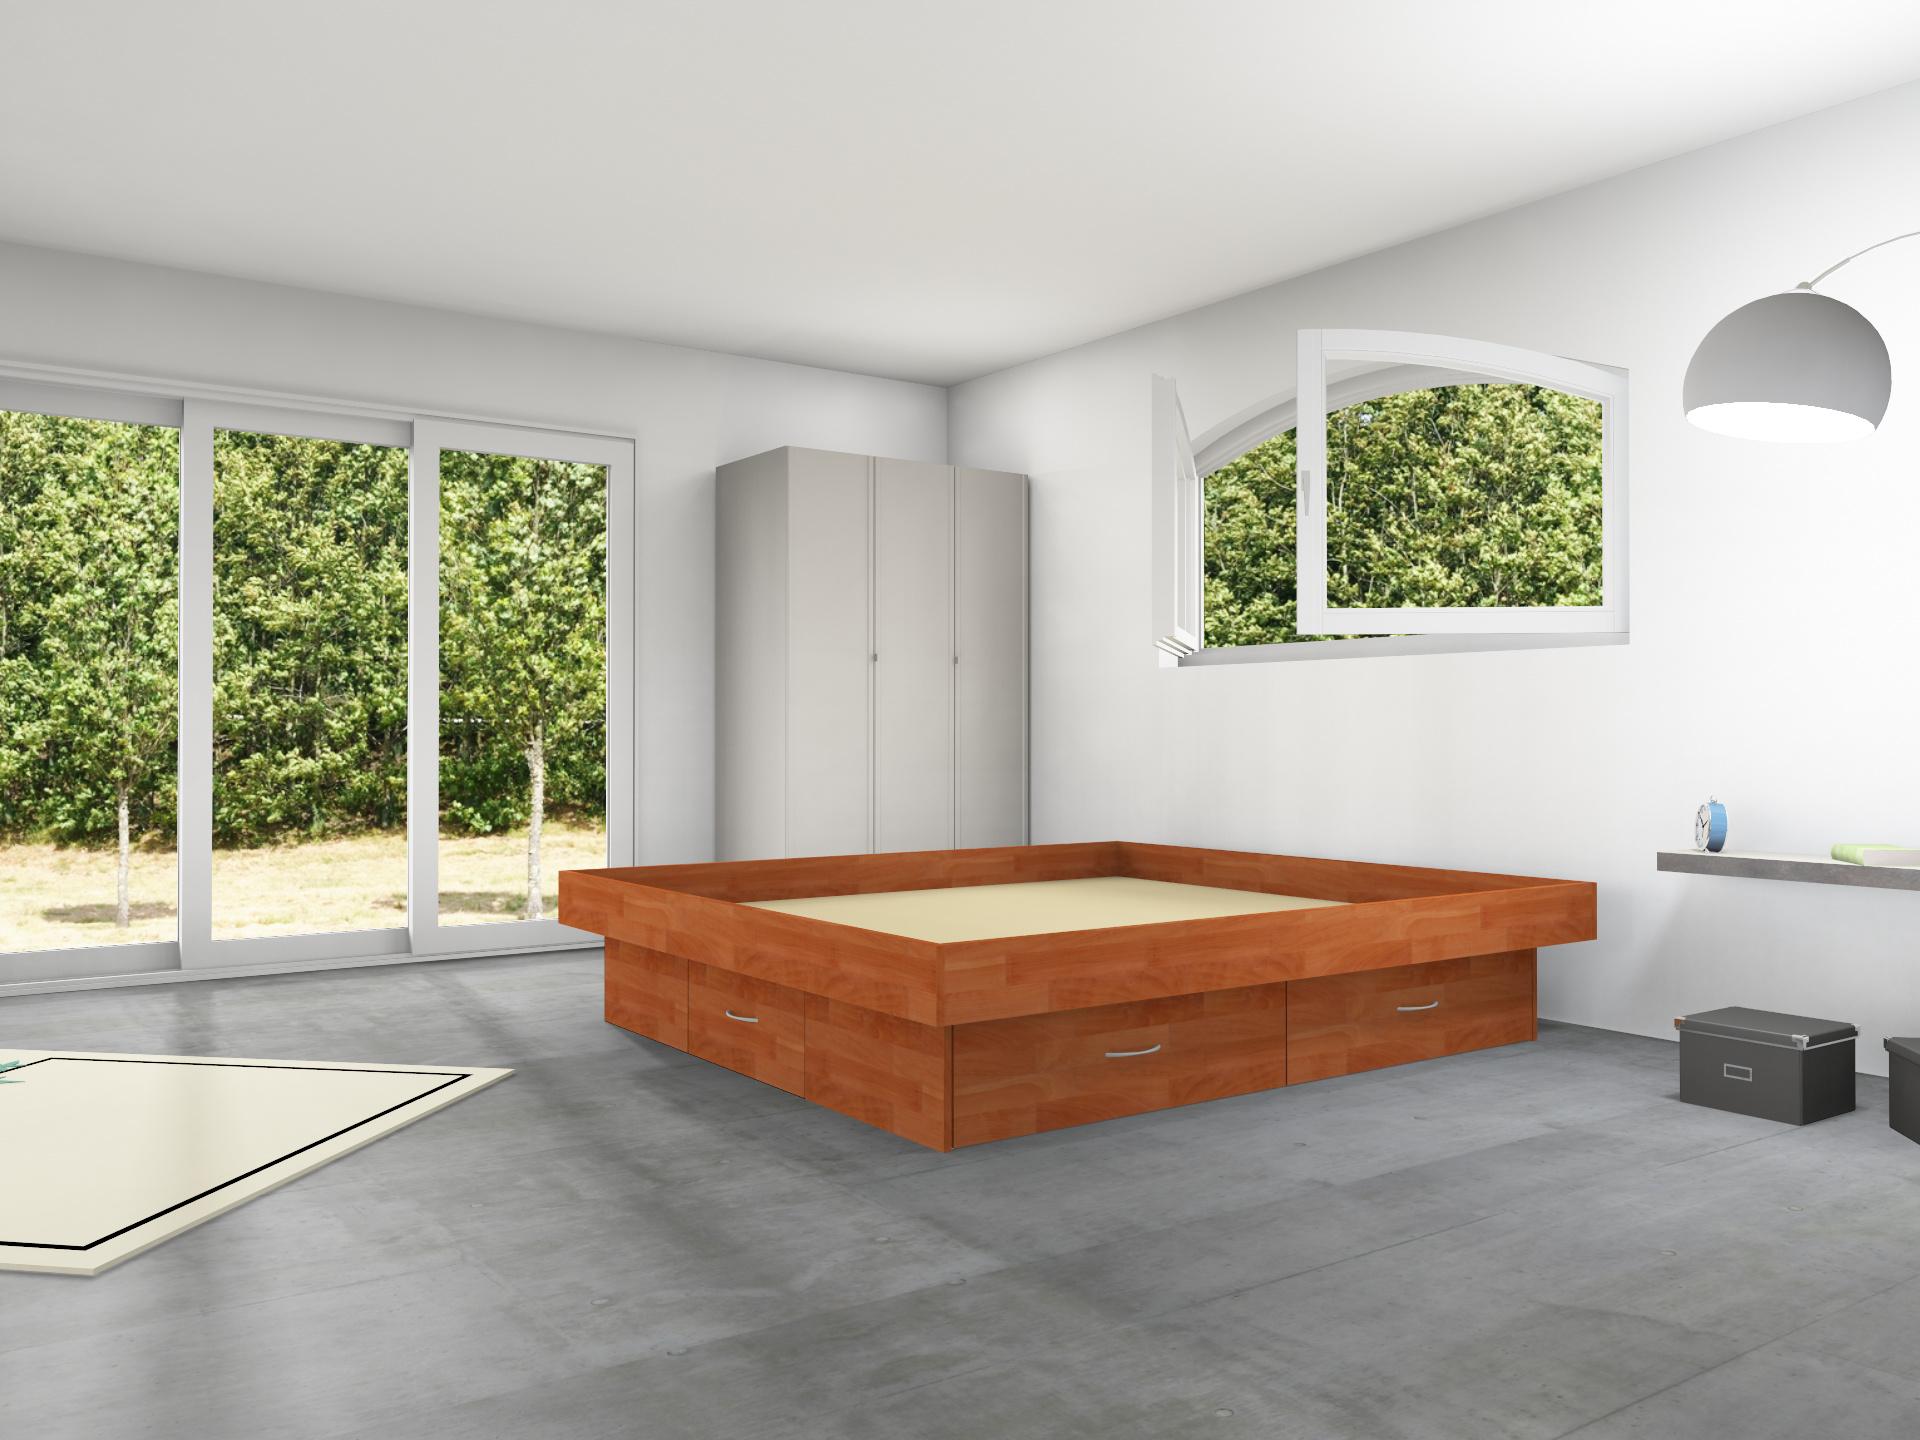 4er Massivholz Schubladen Podest inkl. Umrandung für Wasserbetten